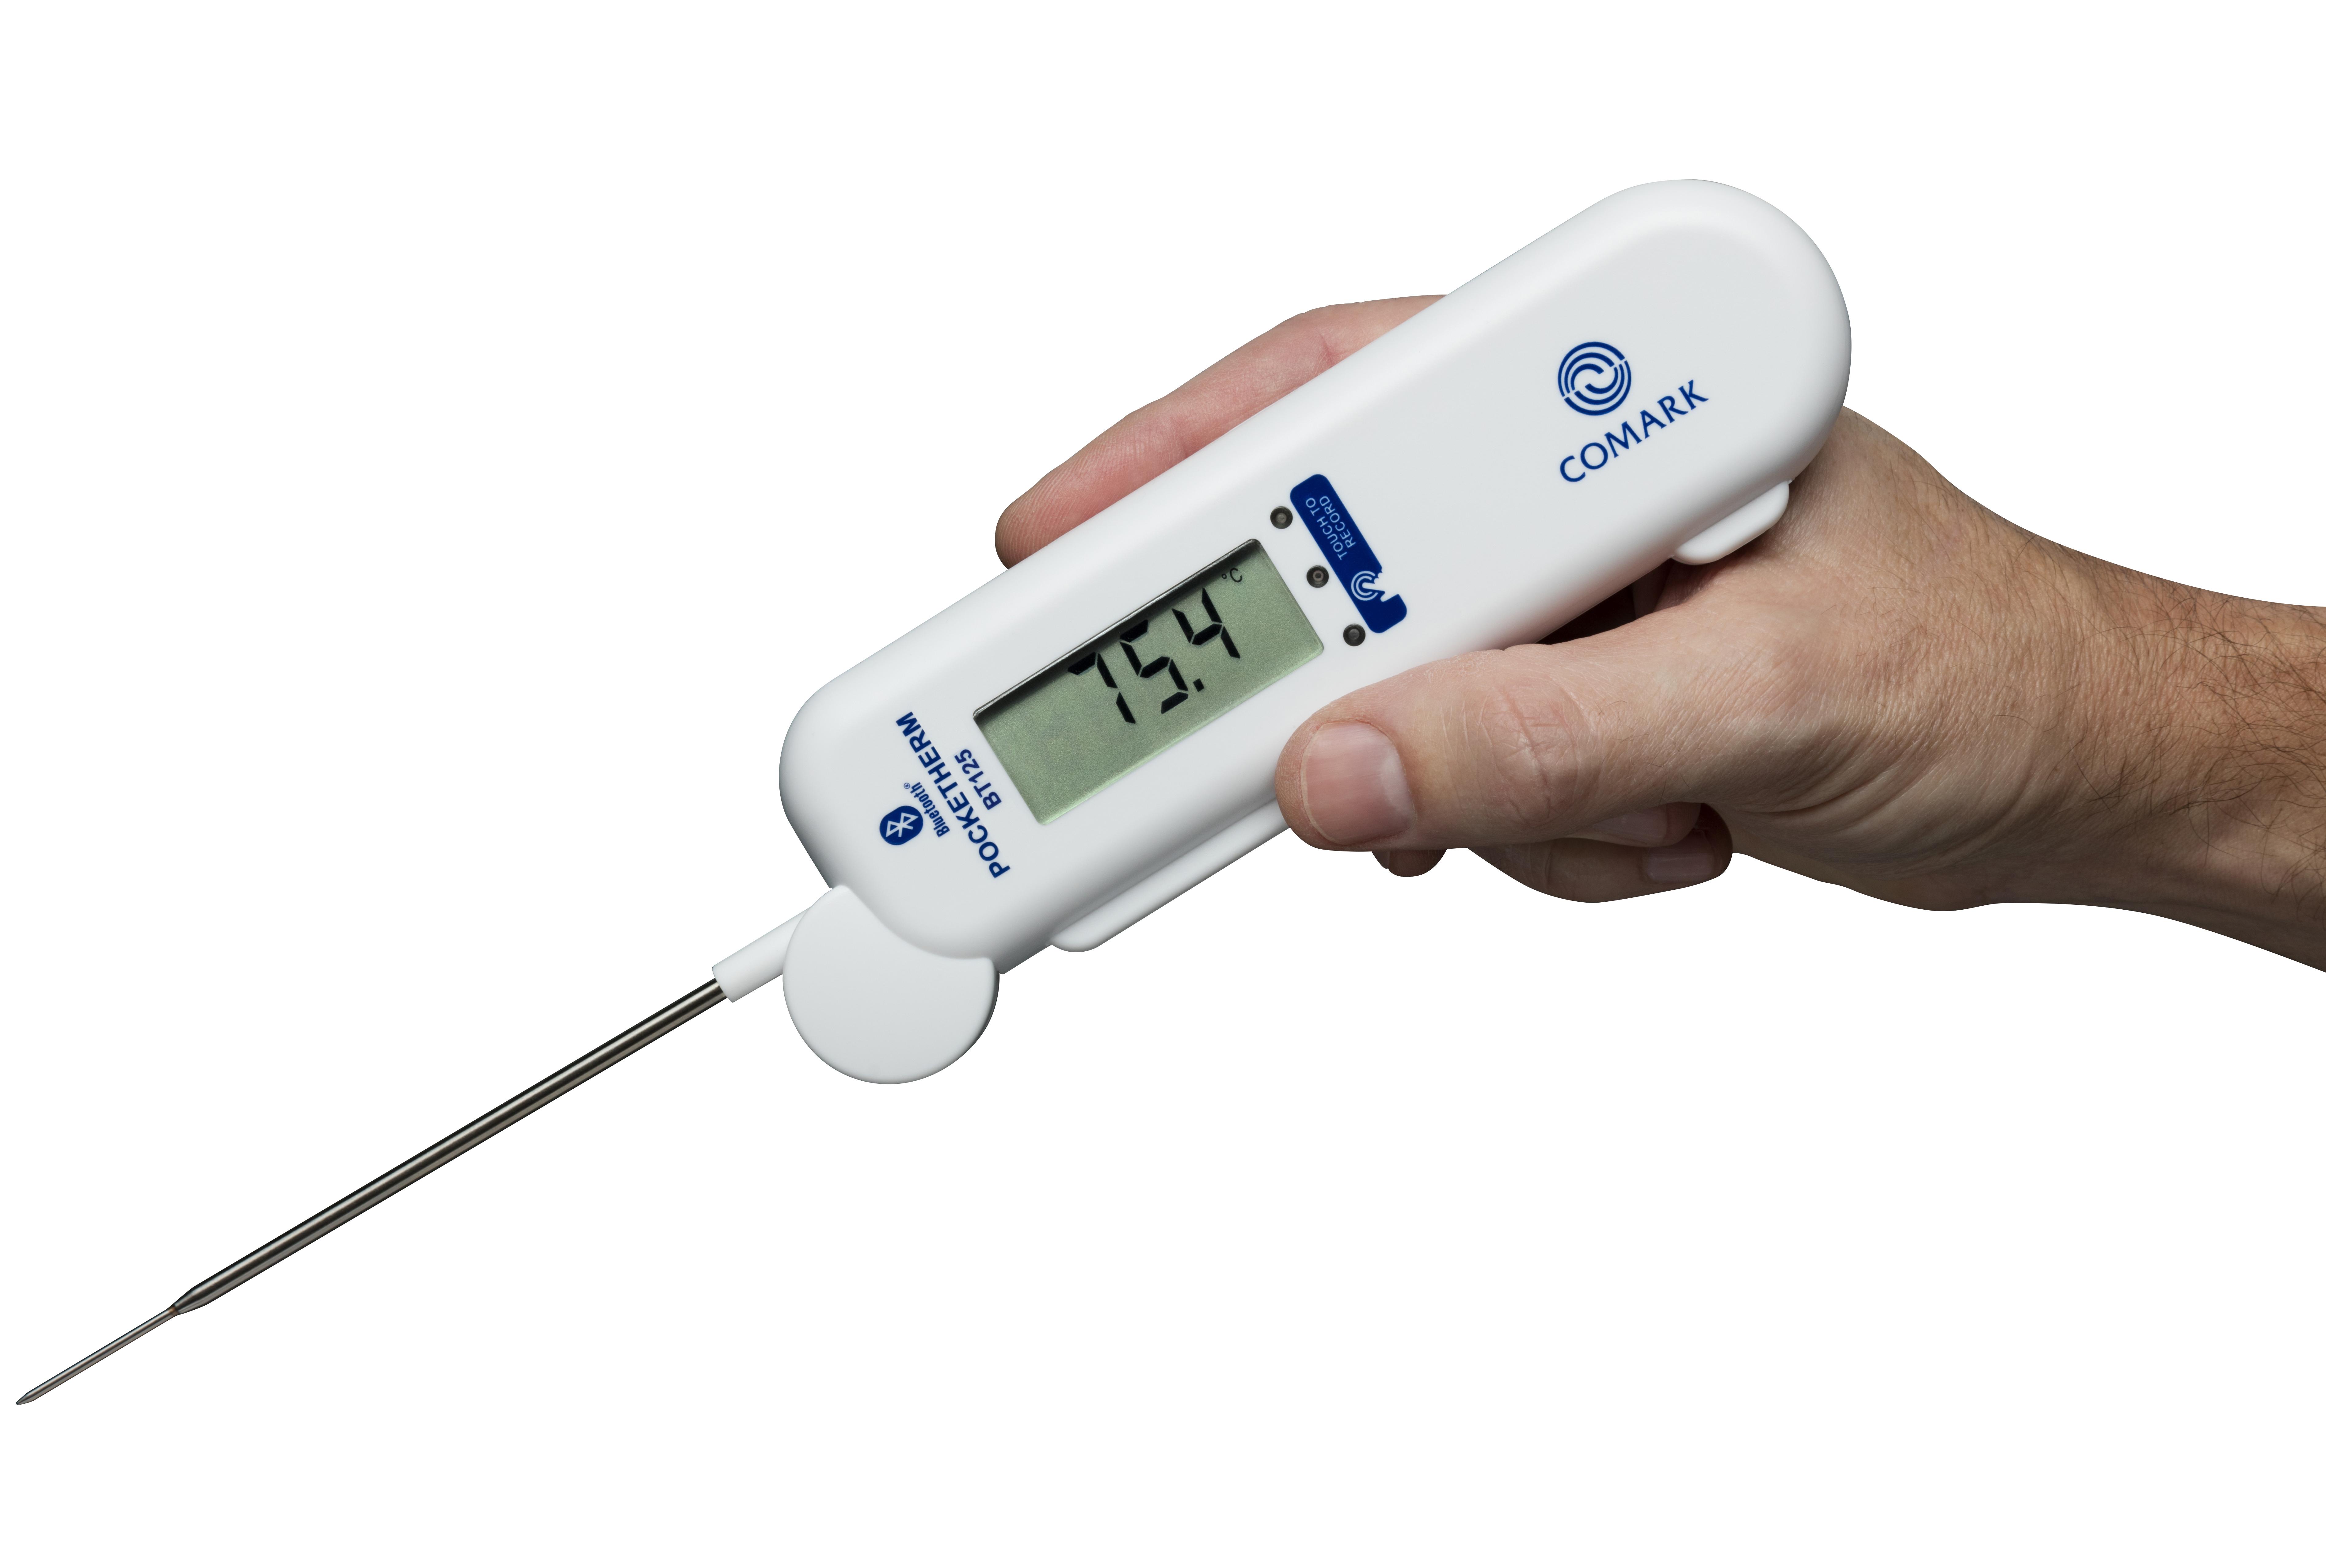 BT250 Bluetooth Pocketherm